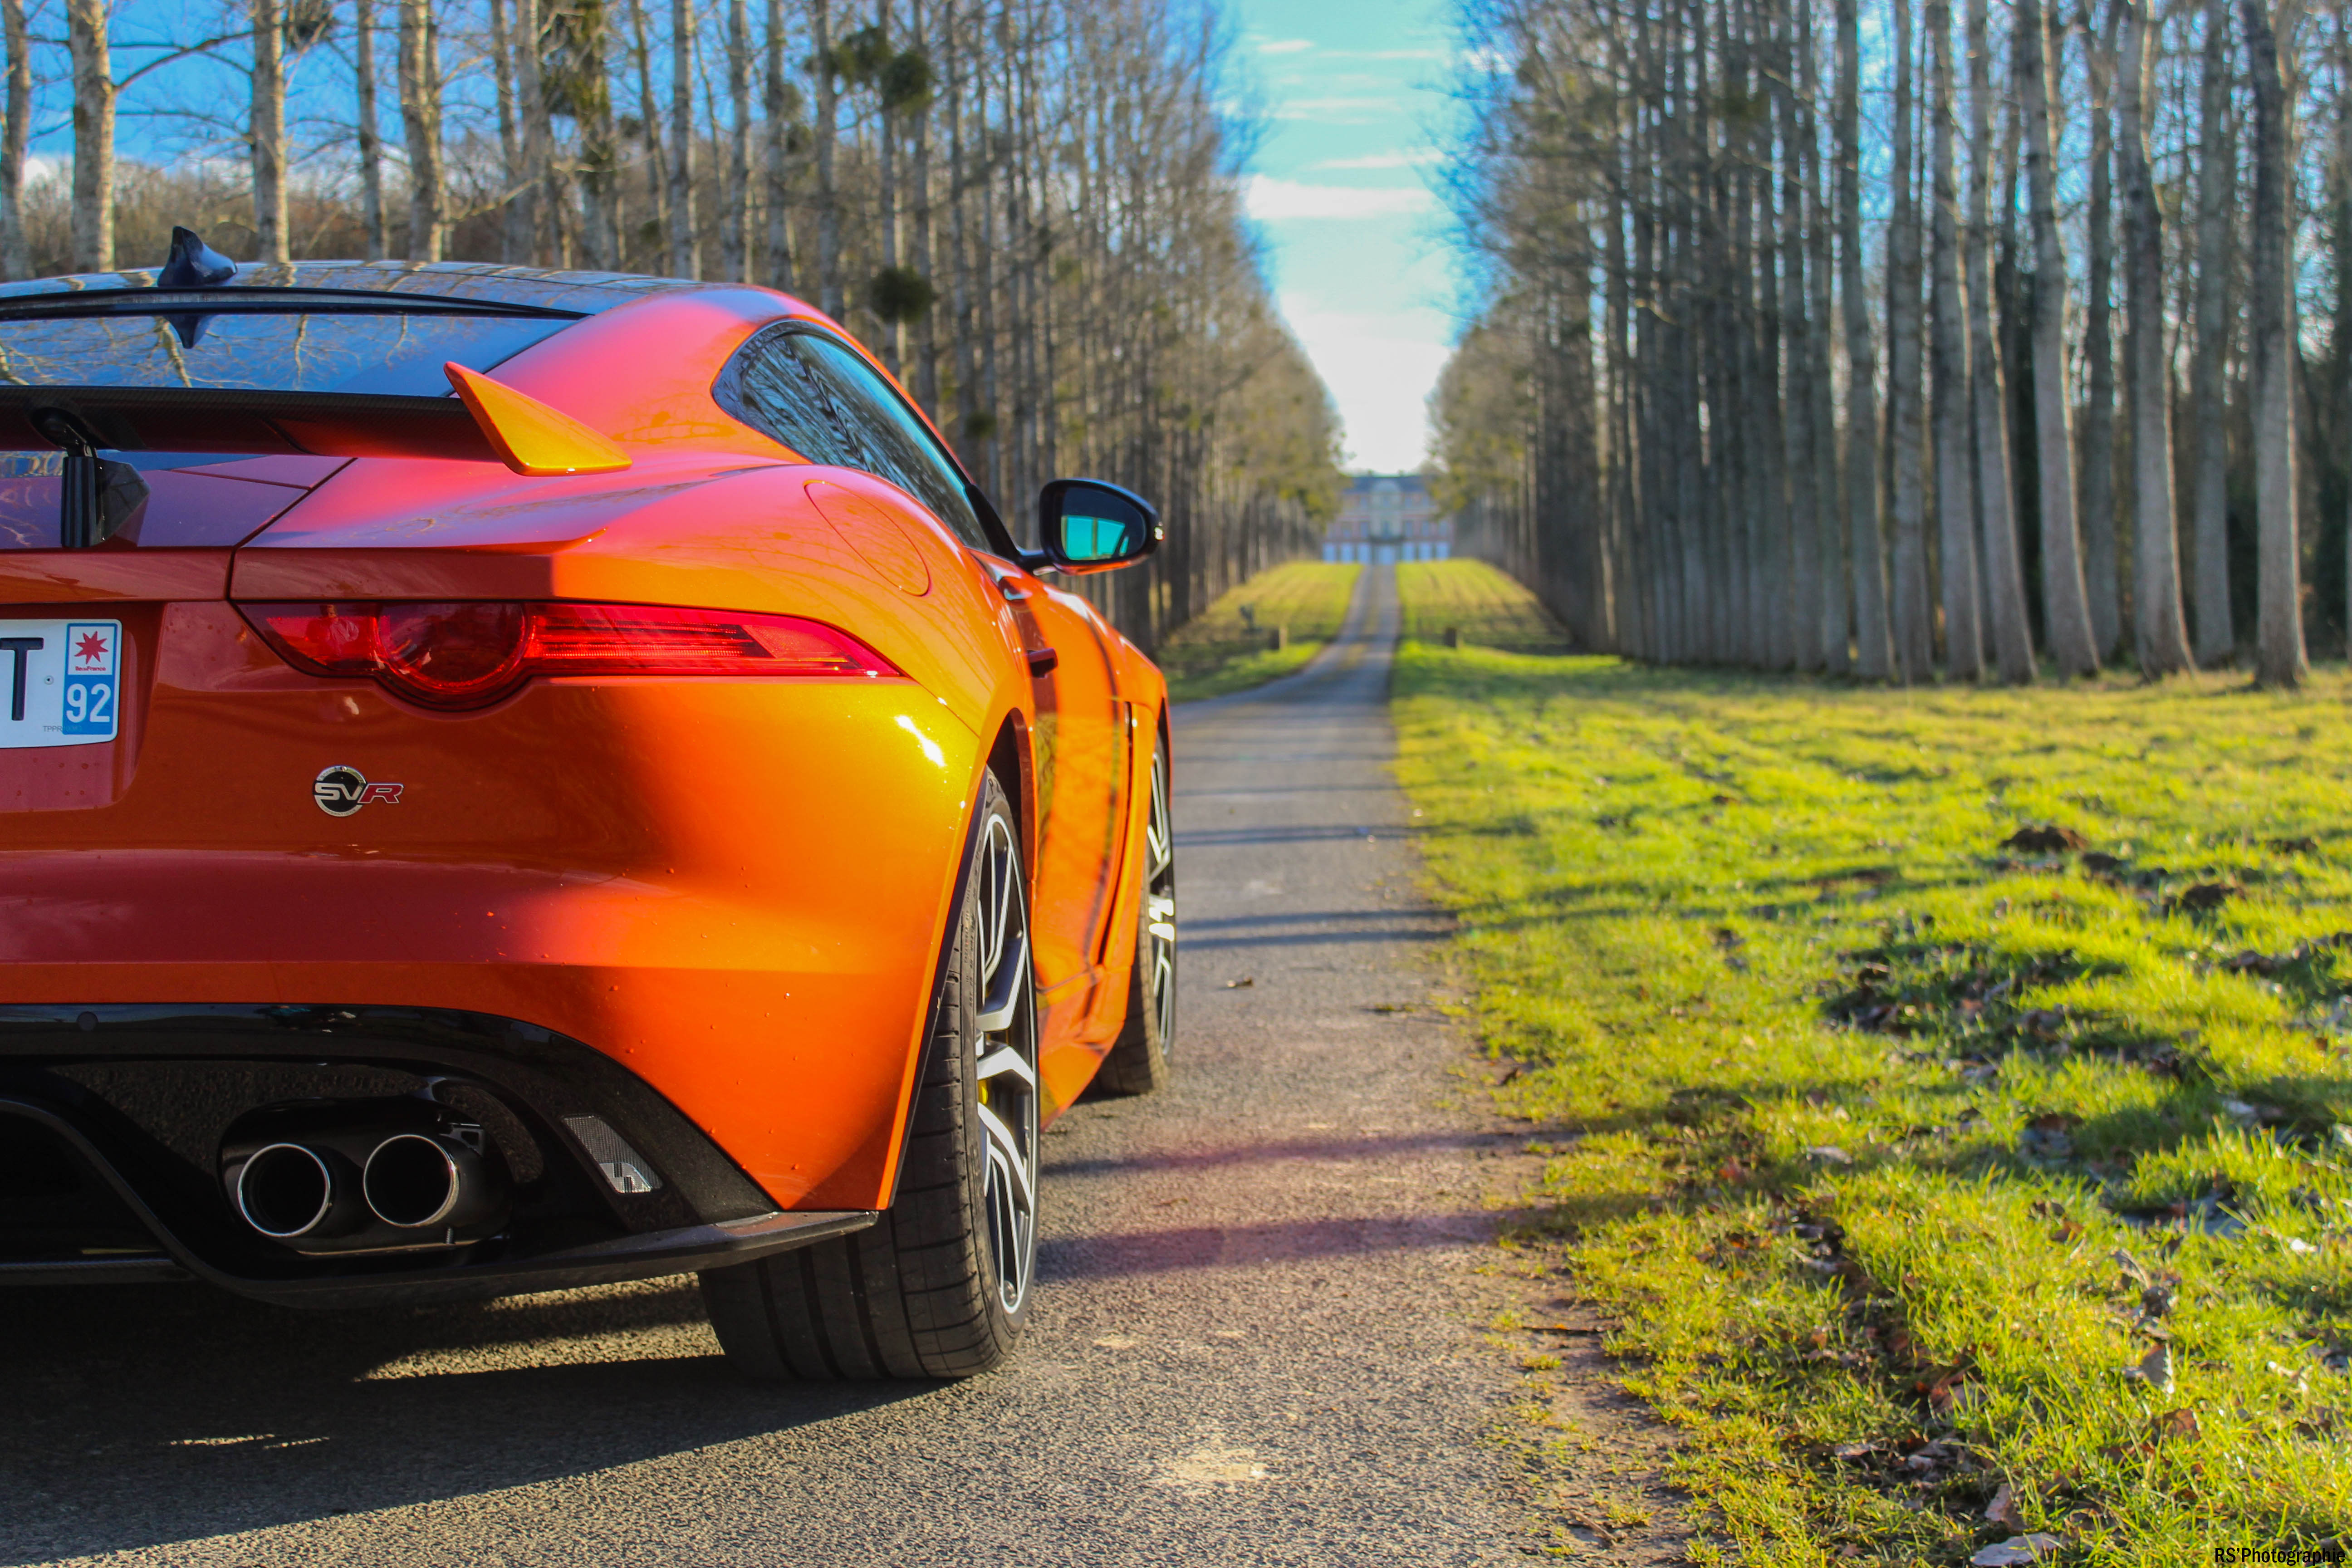 jaguarftypesvr8-jaguar-ftype-svr-arriere-rear-arnaud-demasier-rsphotographie